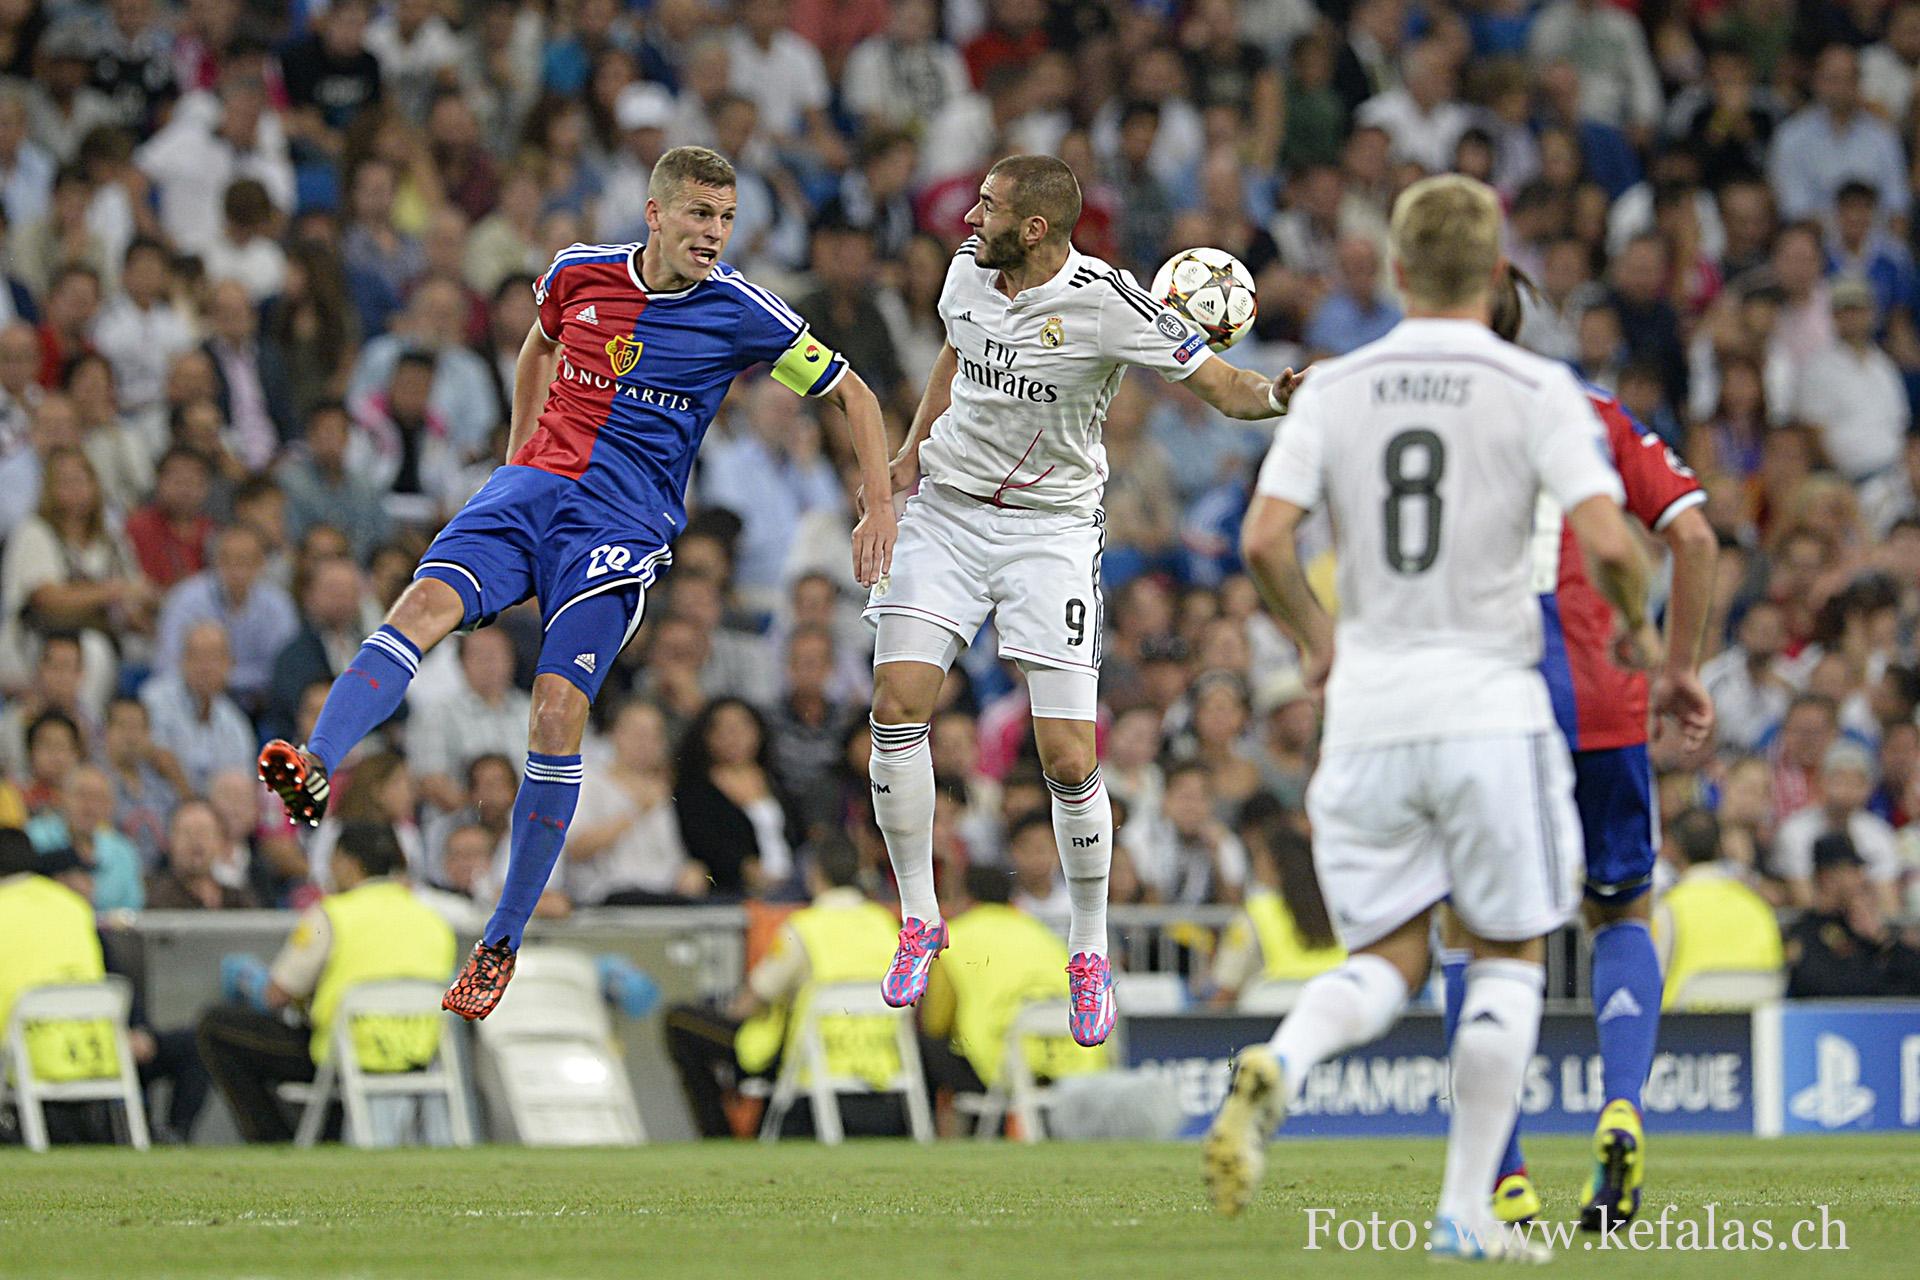 FF_CL_Real Madrid-FCB_16.9.14_4.jpg